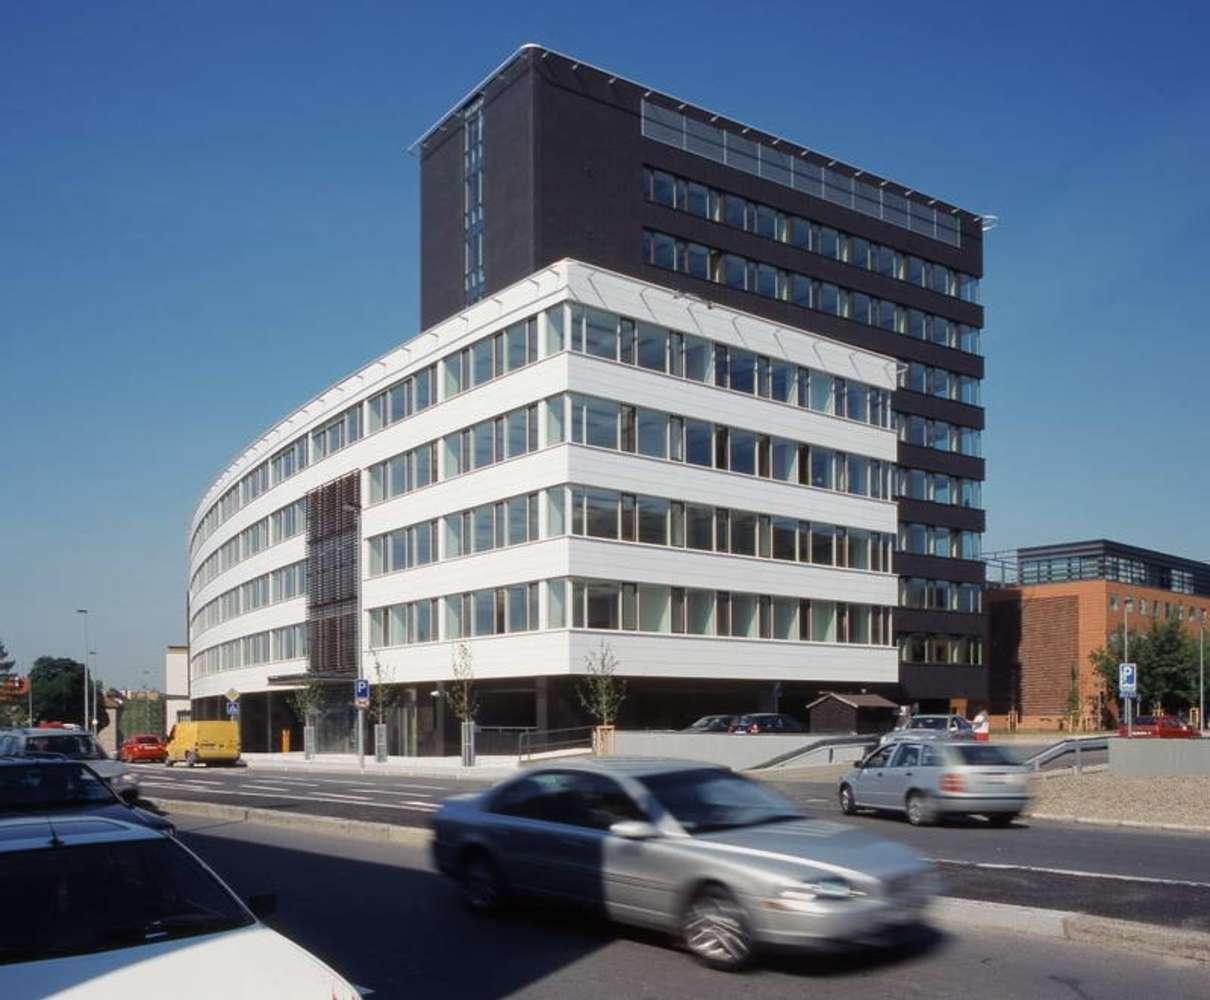 Coworking a servisované kanceláře Praha, 140 00 - Serviced Offices & Coworking Budějovická Alej